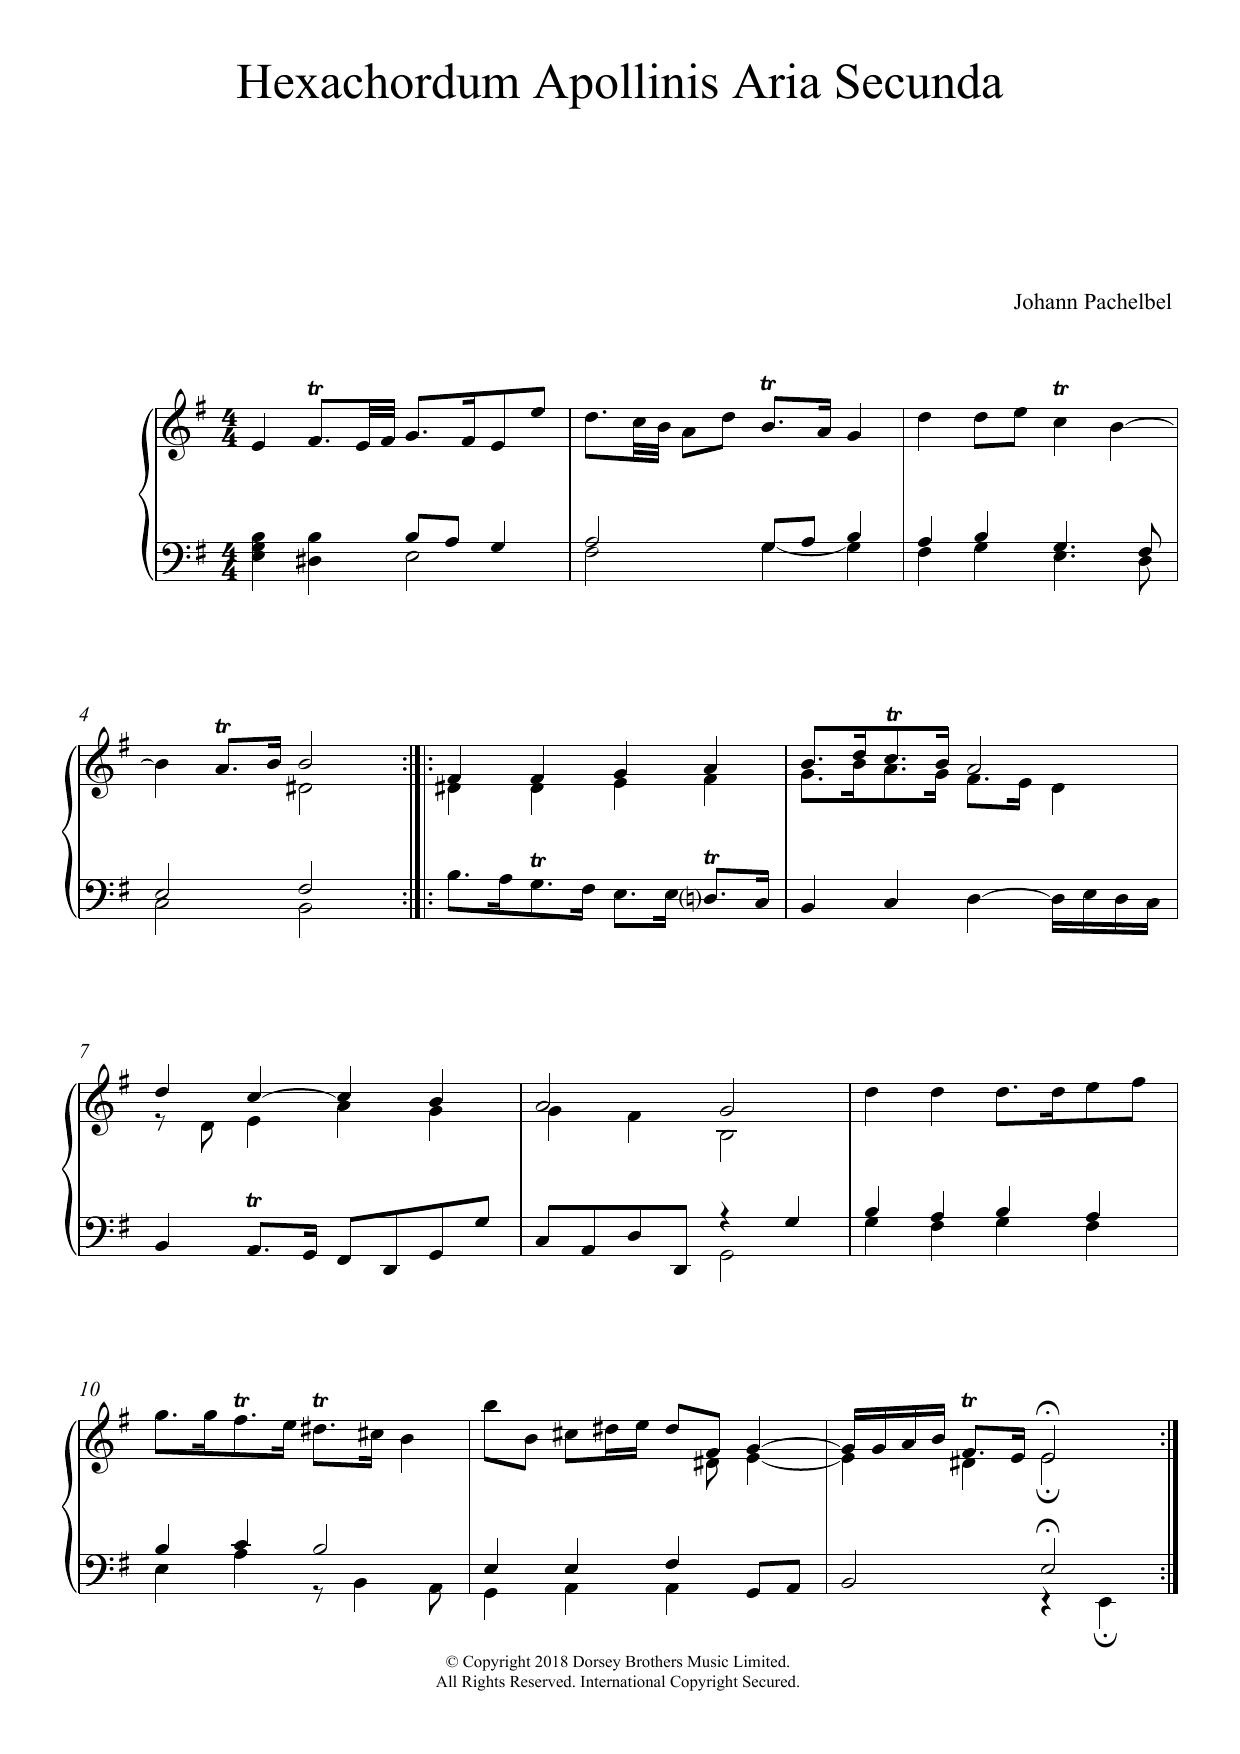 Hexachordum Apollinis: Aria Secunda Sheet Music